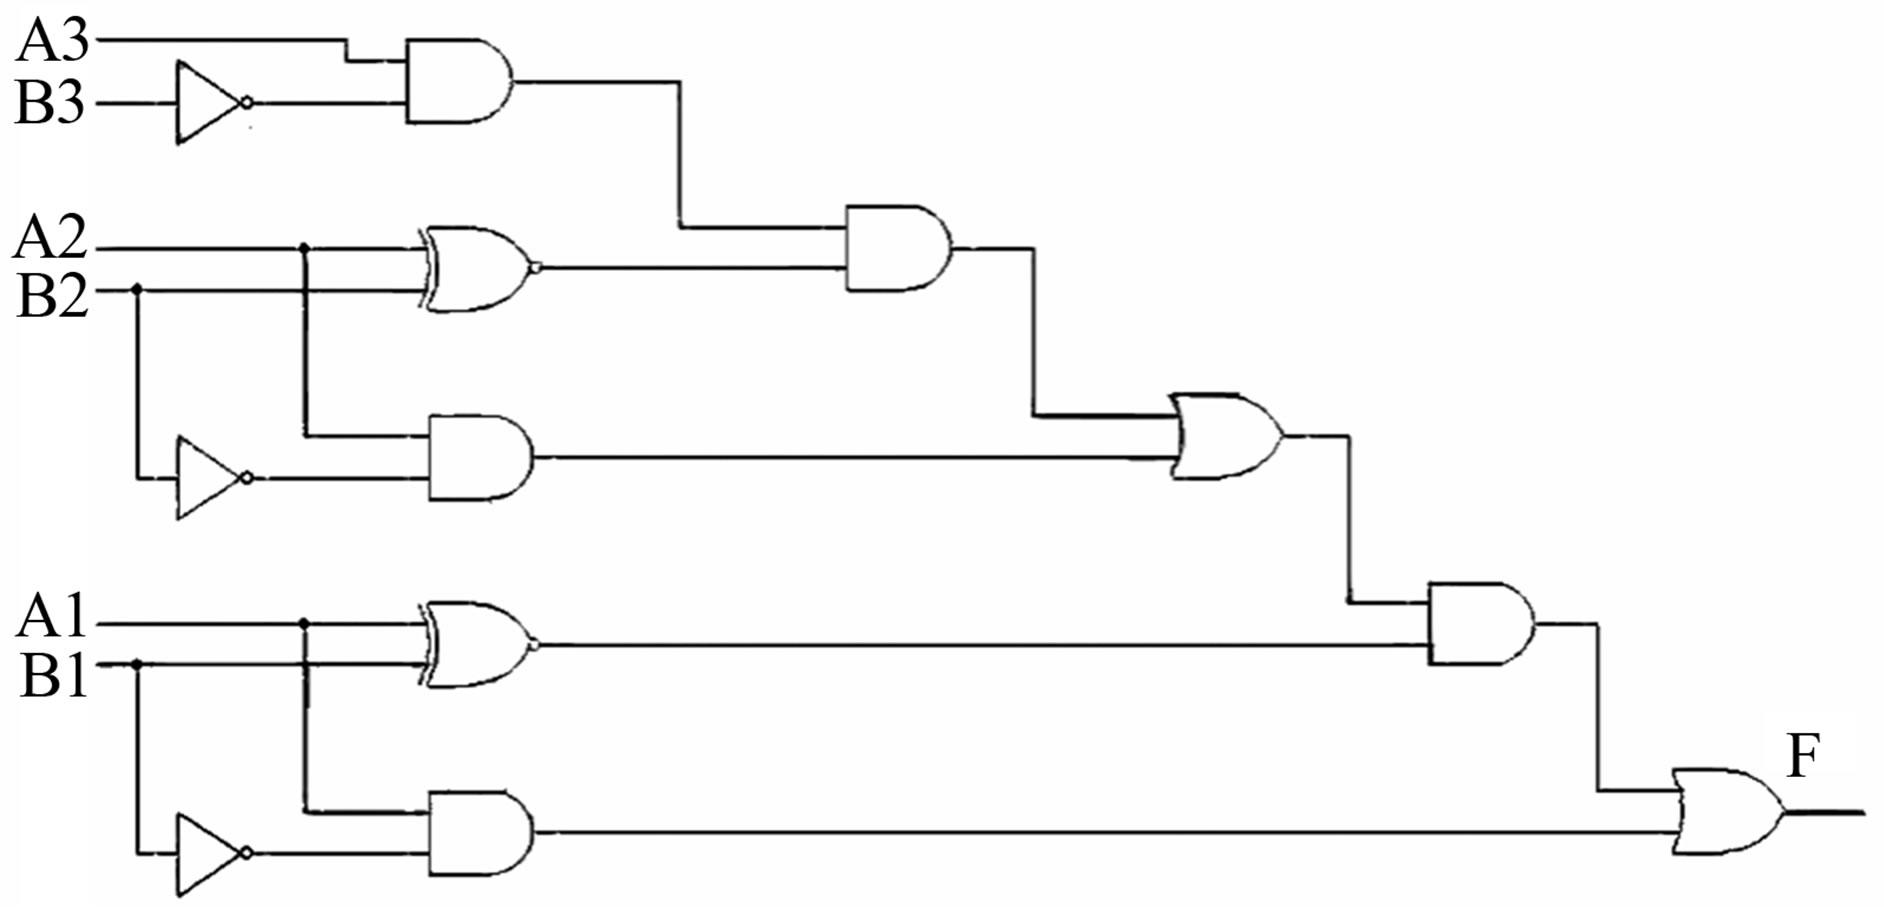 fun practice and test  comparator using logic gates